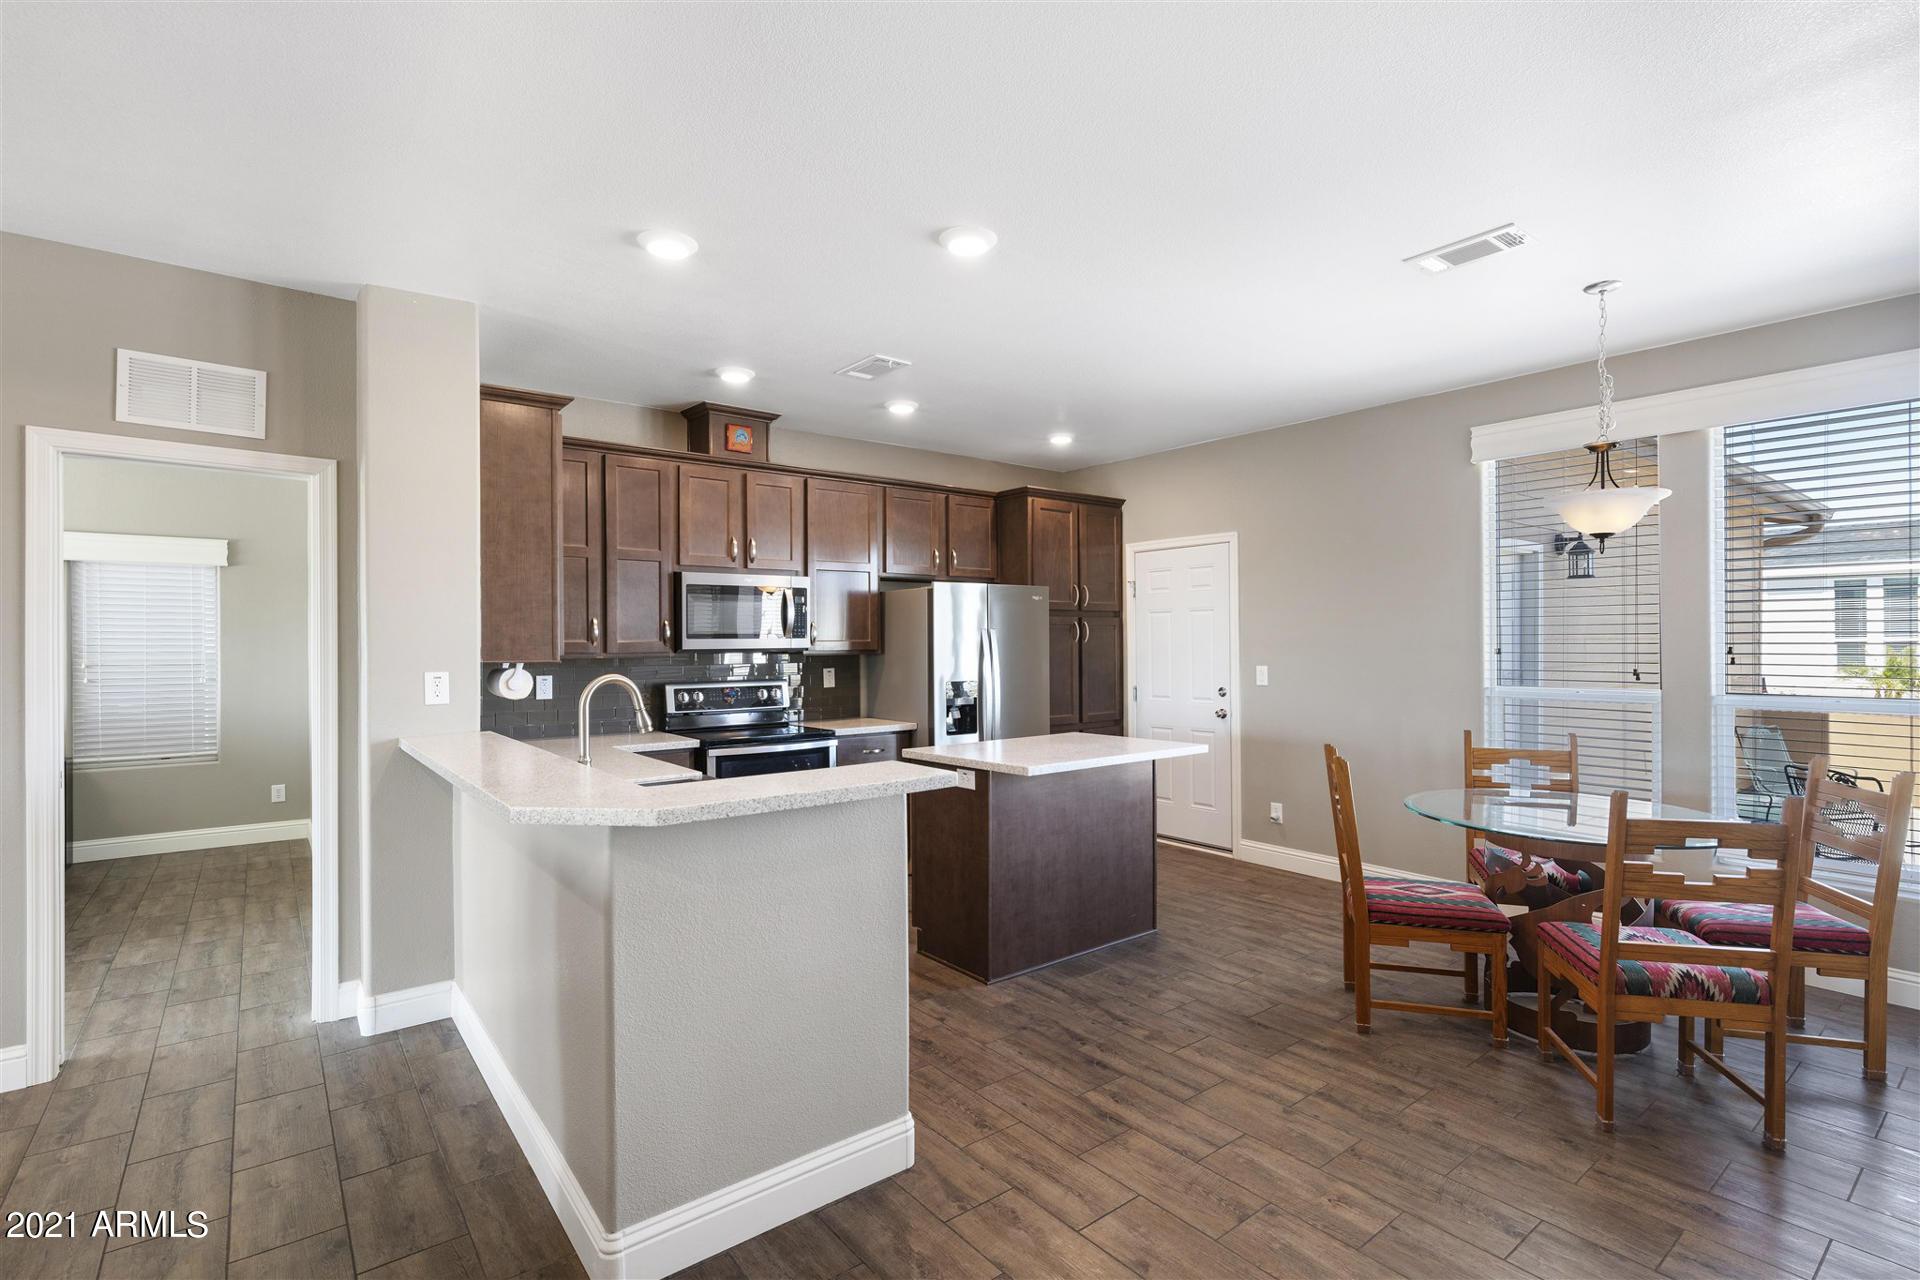 3301 S GOLDFIELD Road, Apache Junction, Arizona 85119, 2 Bedrooms Bedrooms, ,2 BathroomsBathrooms,Residential,For Sale,3301 S GOLDFIELD Road,1,6212361